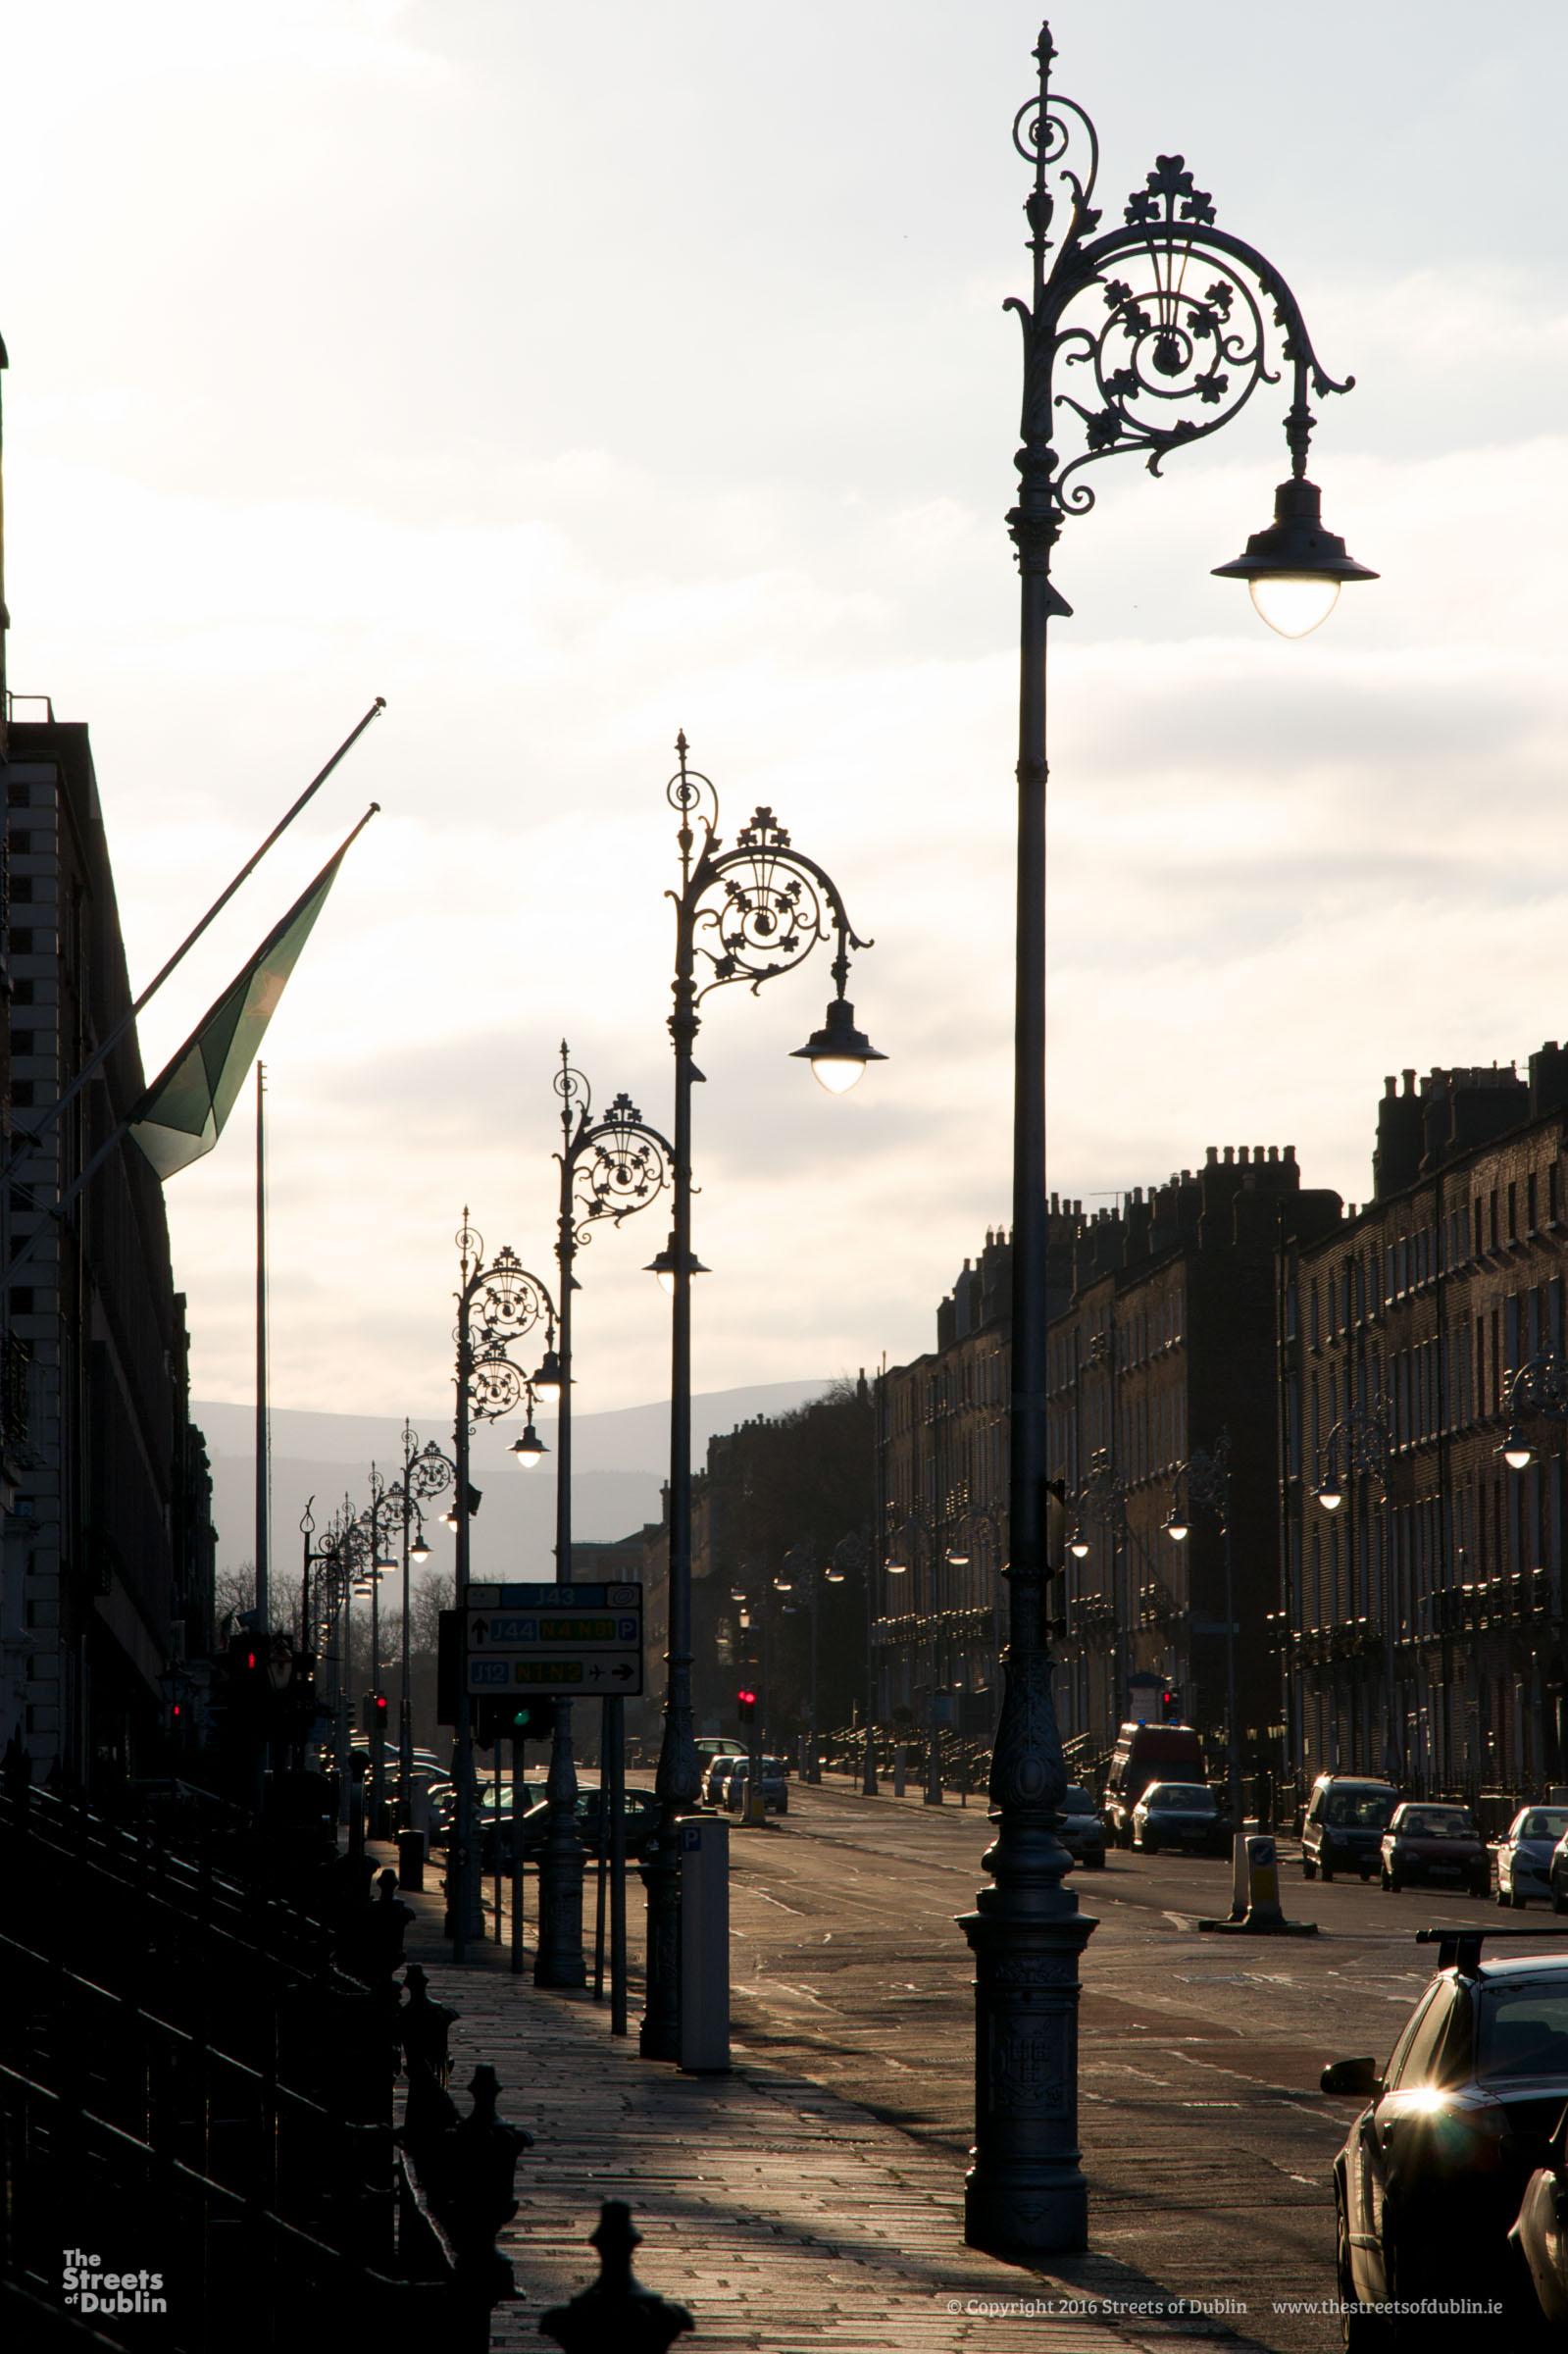 Streets-of-Dublin-Photo-800.jpg